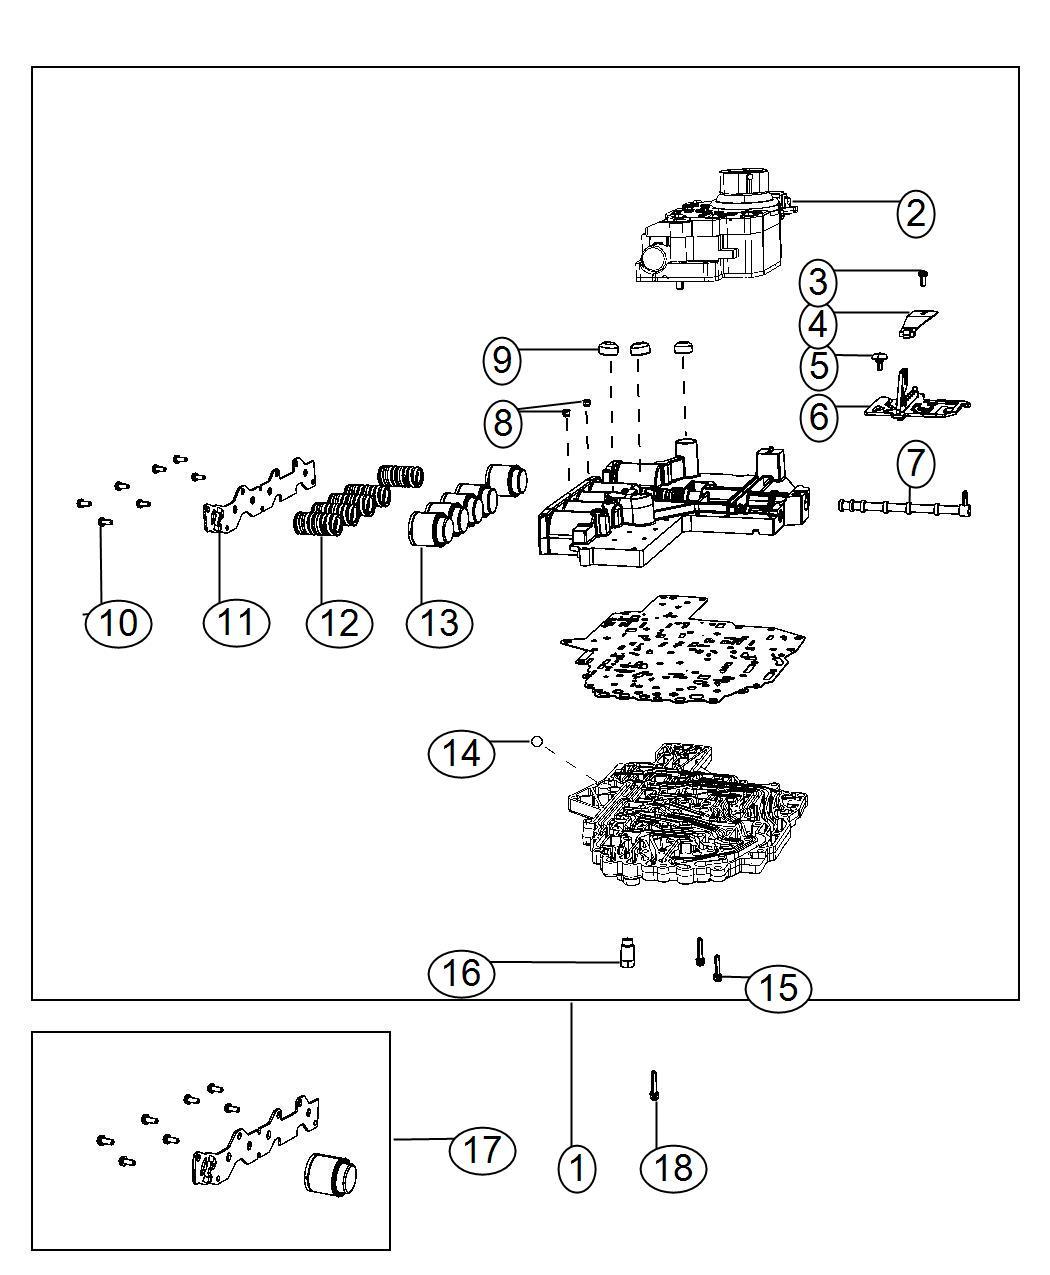 Ram Solenoid Solenoid Package Transmission Valve